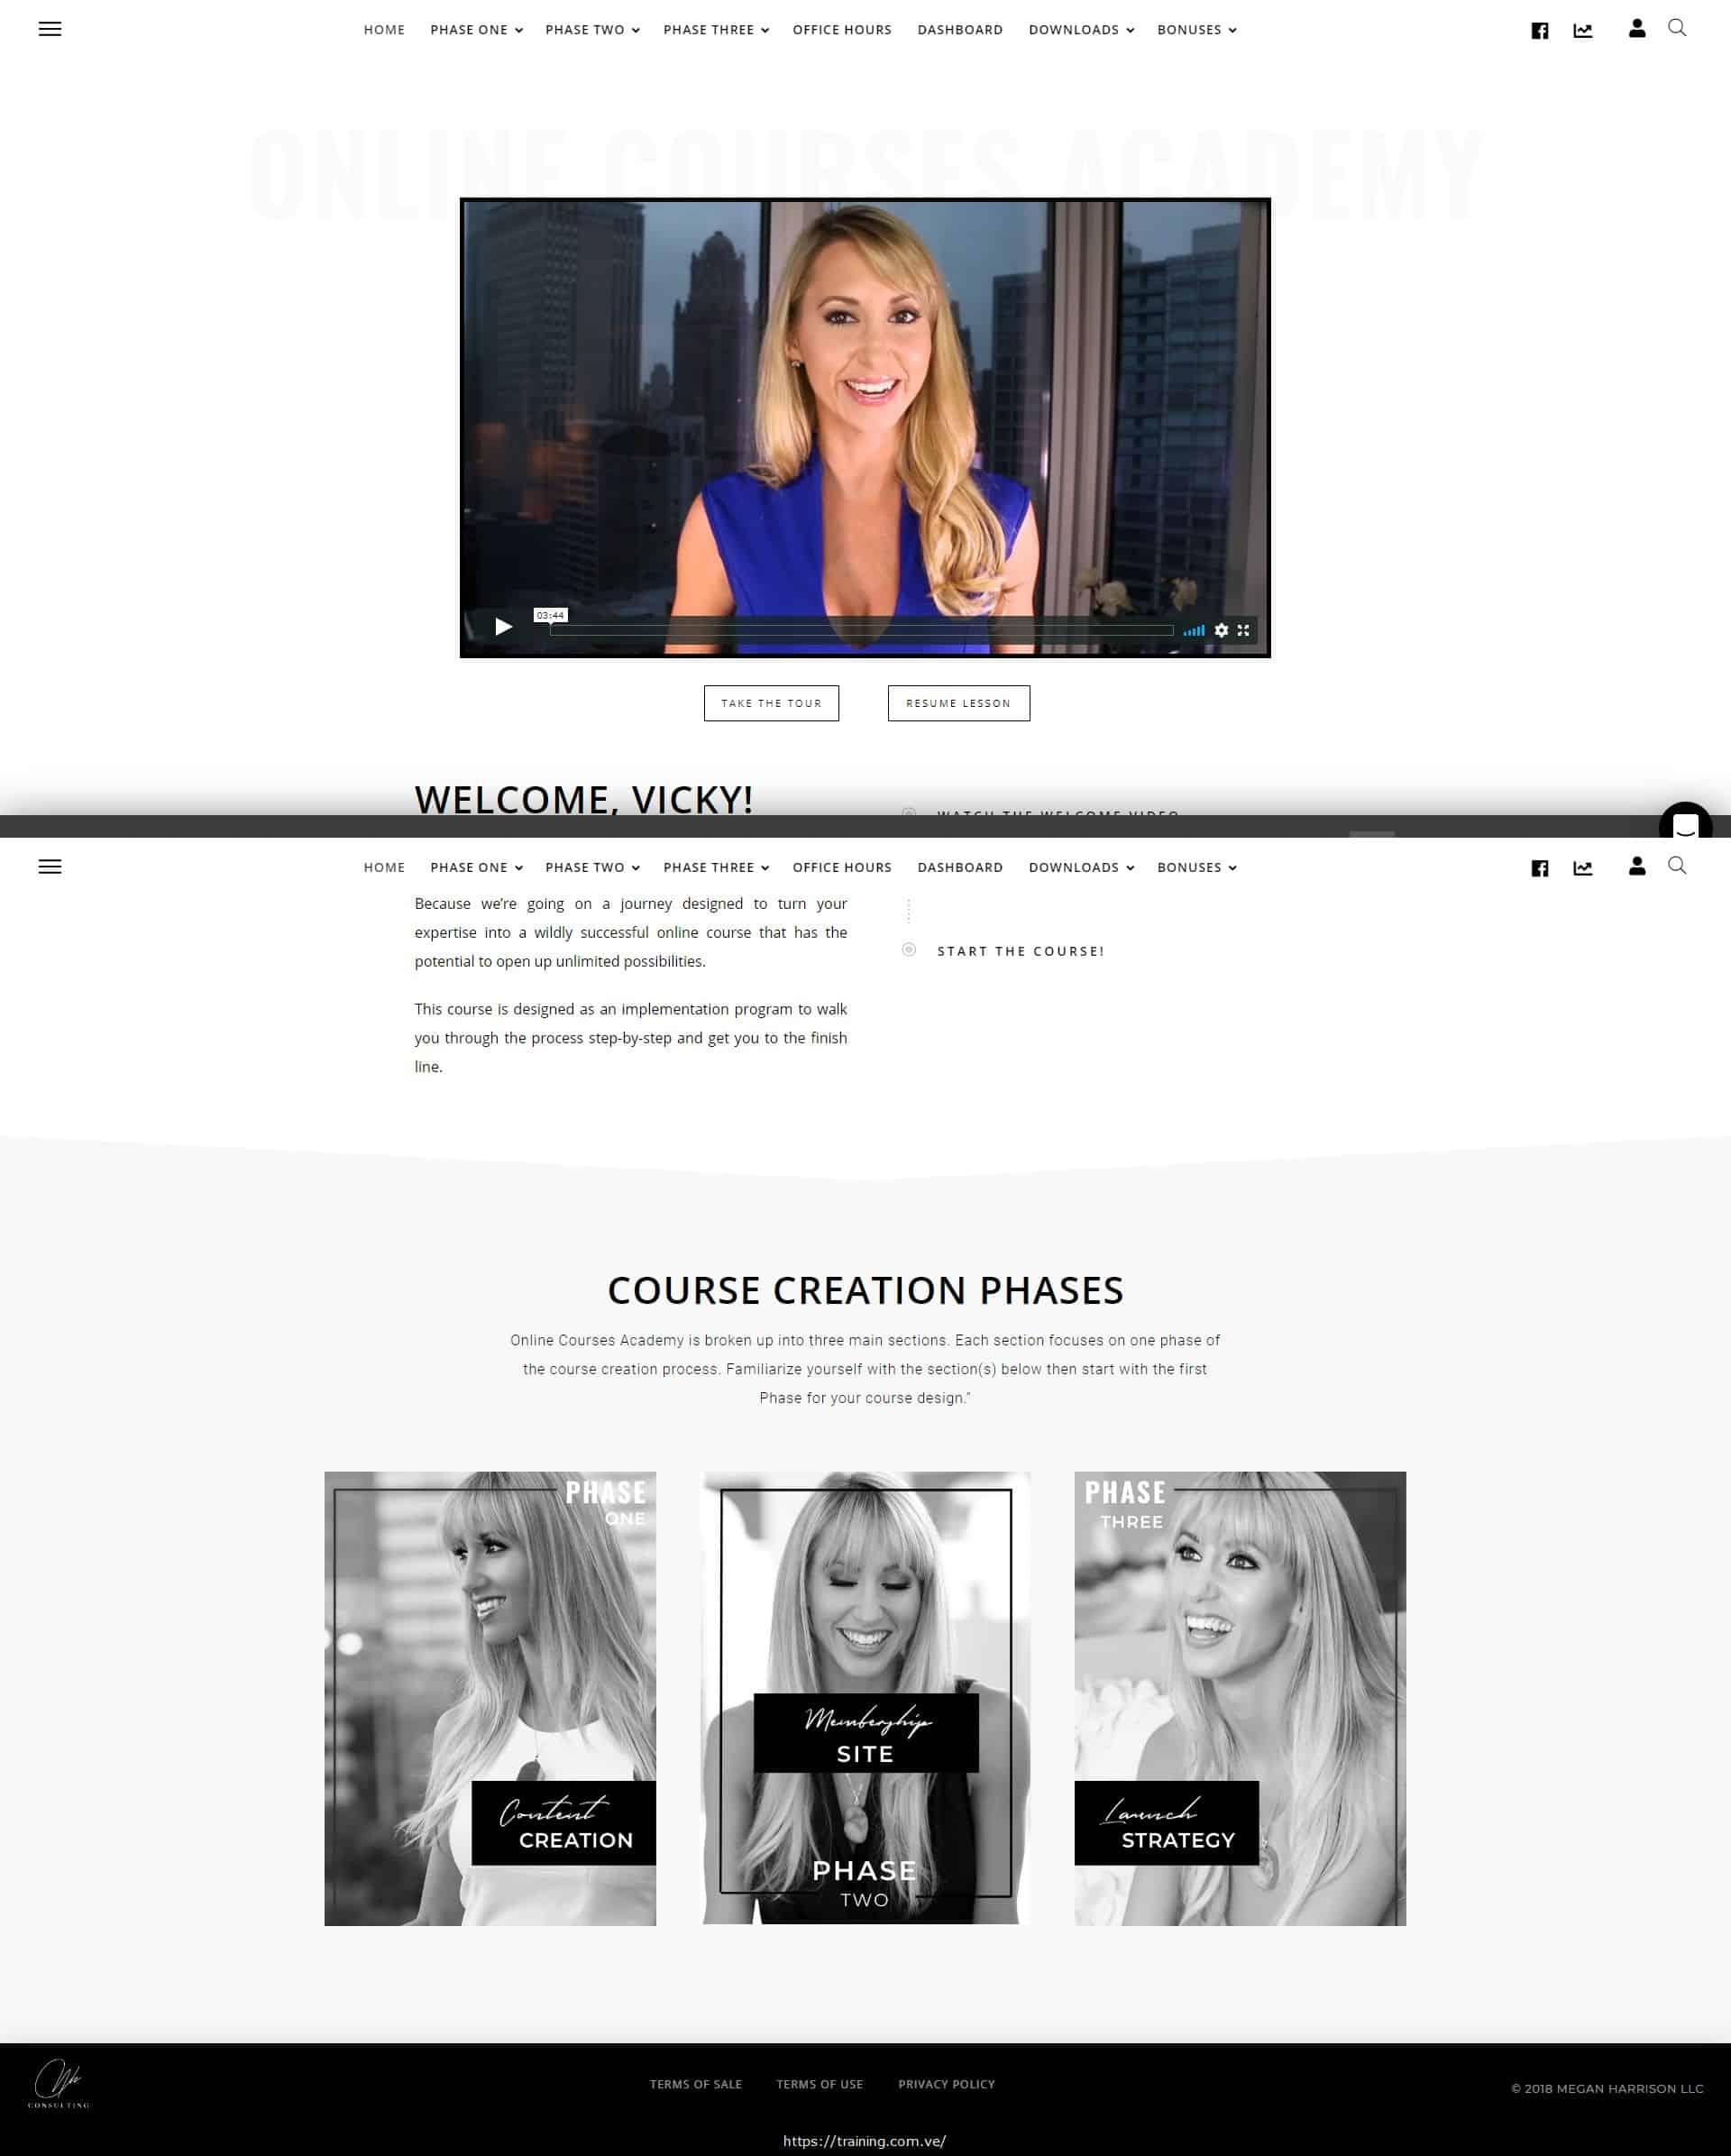 Online Course Academy by Megan K Harrison Download